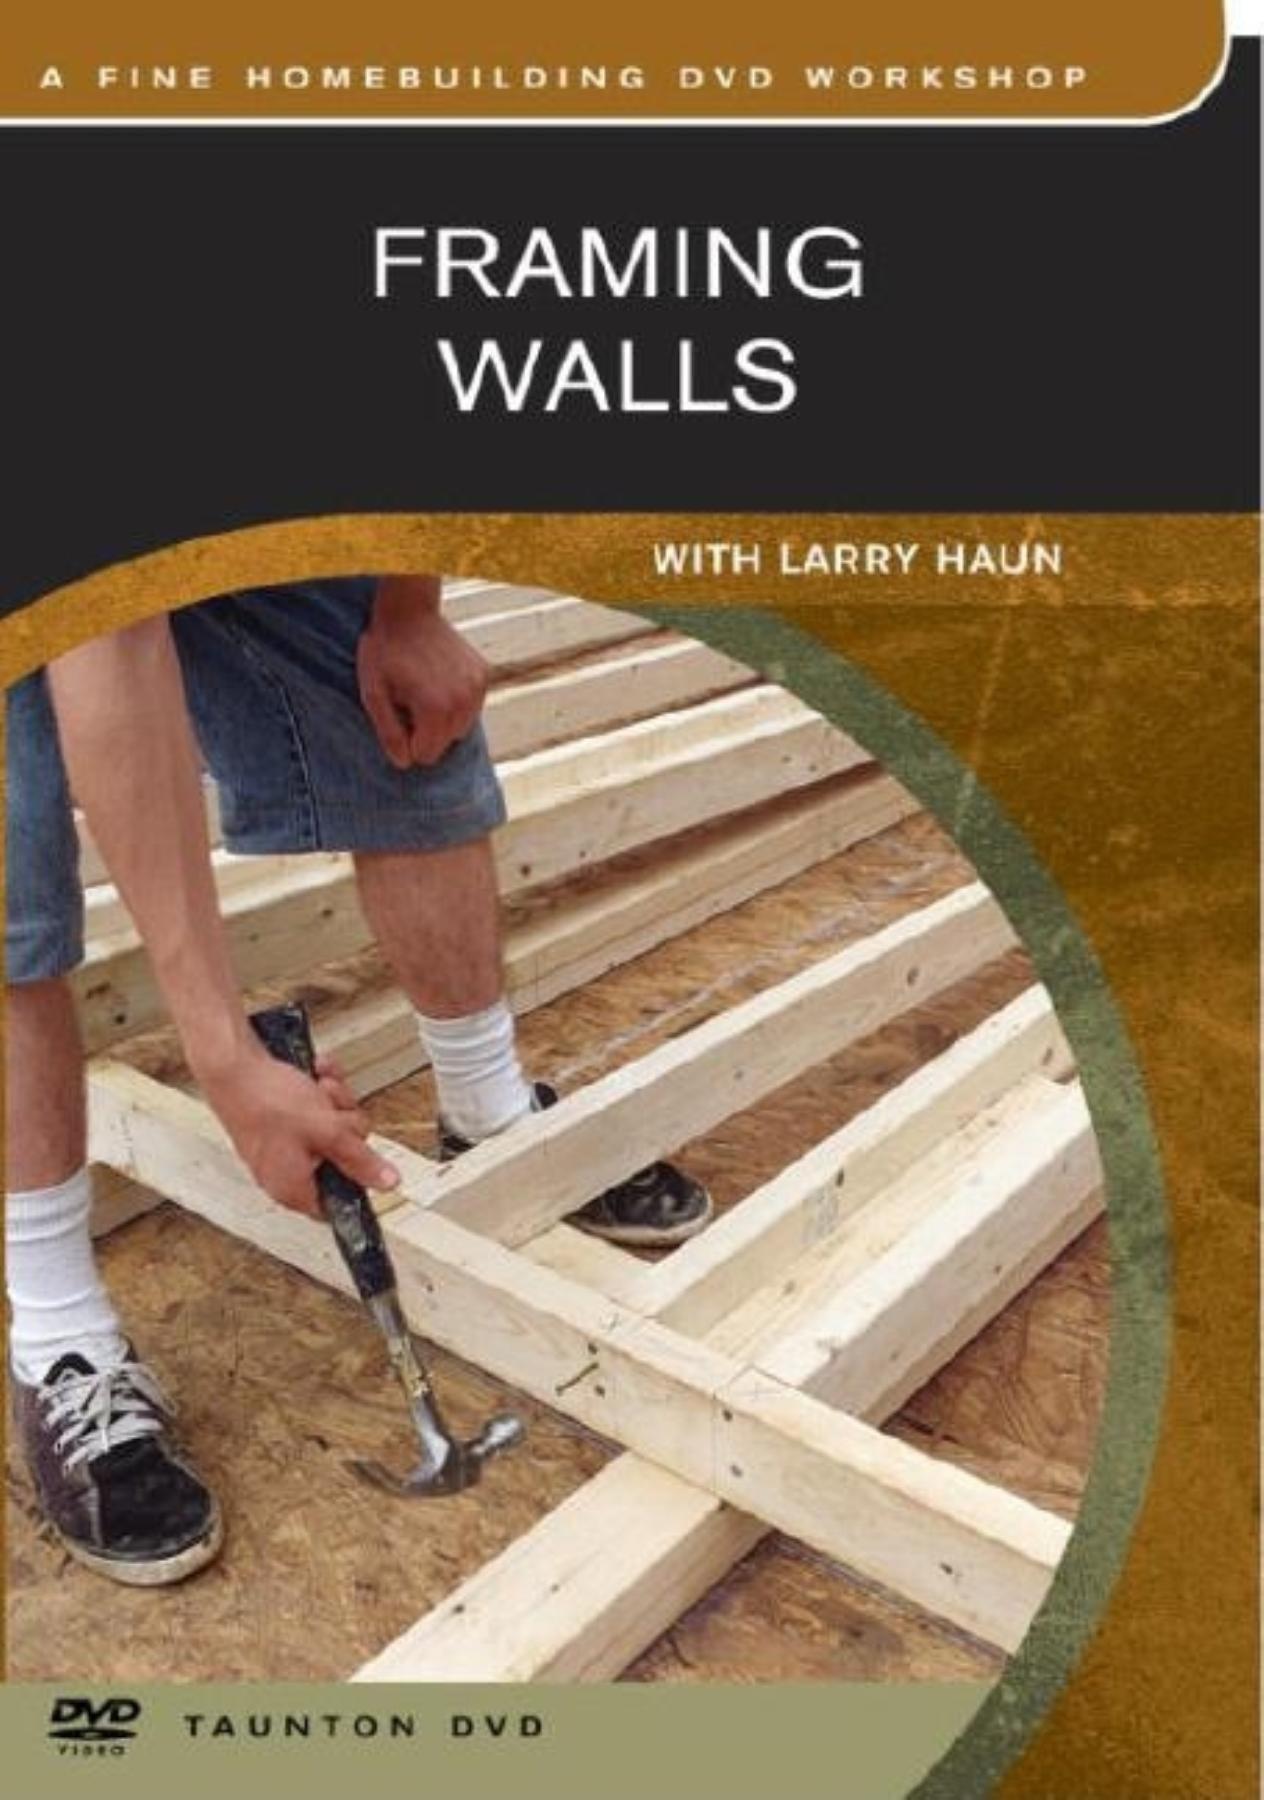 framing walls fine homebuilding dvd workshop larry haun 9781561587186 amazoncom books